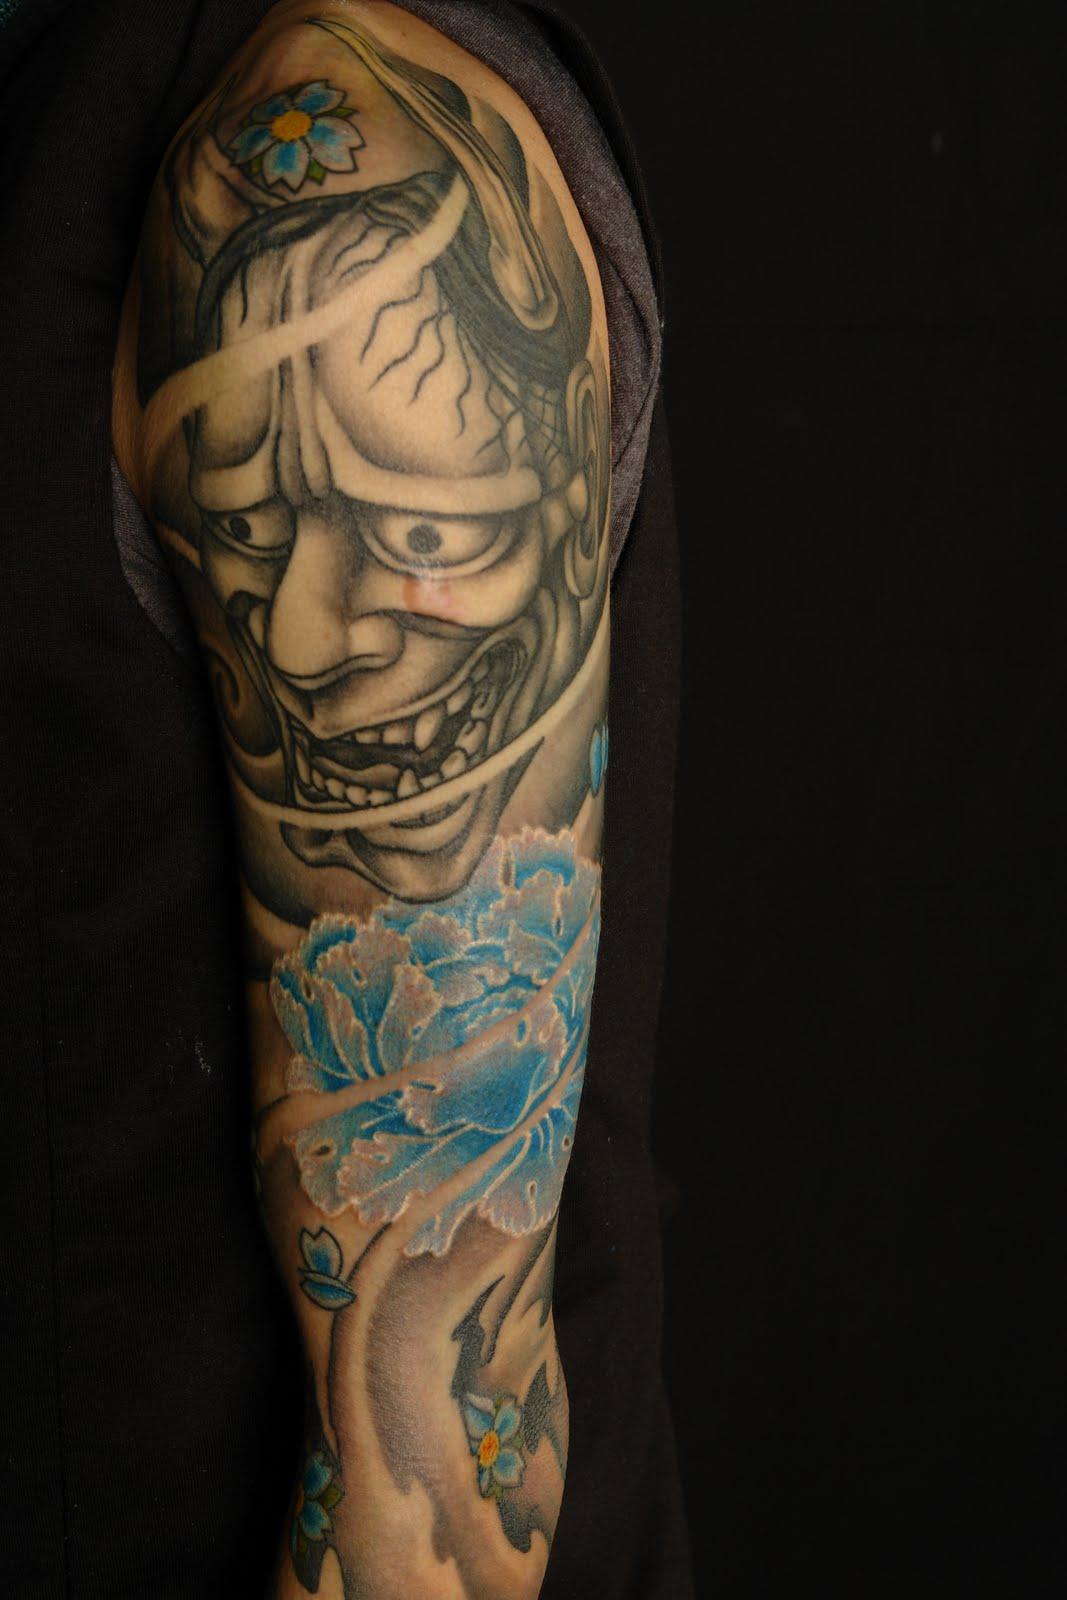 Shane tattoos hanya half sleeve on jacky for Half sleeve tattoos